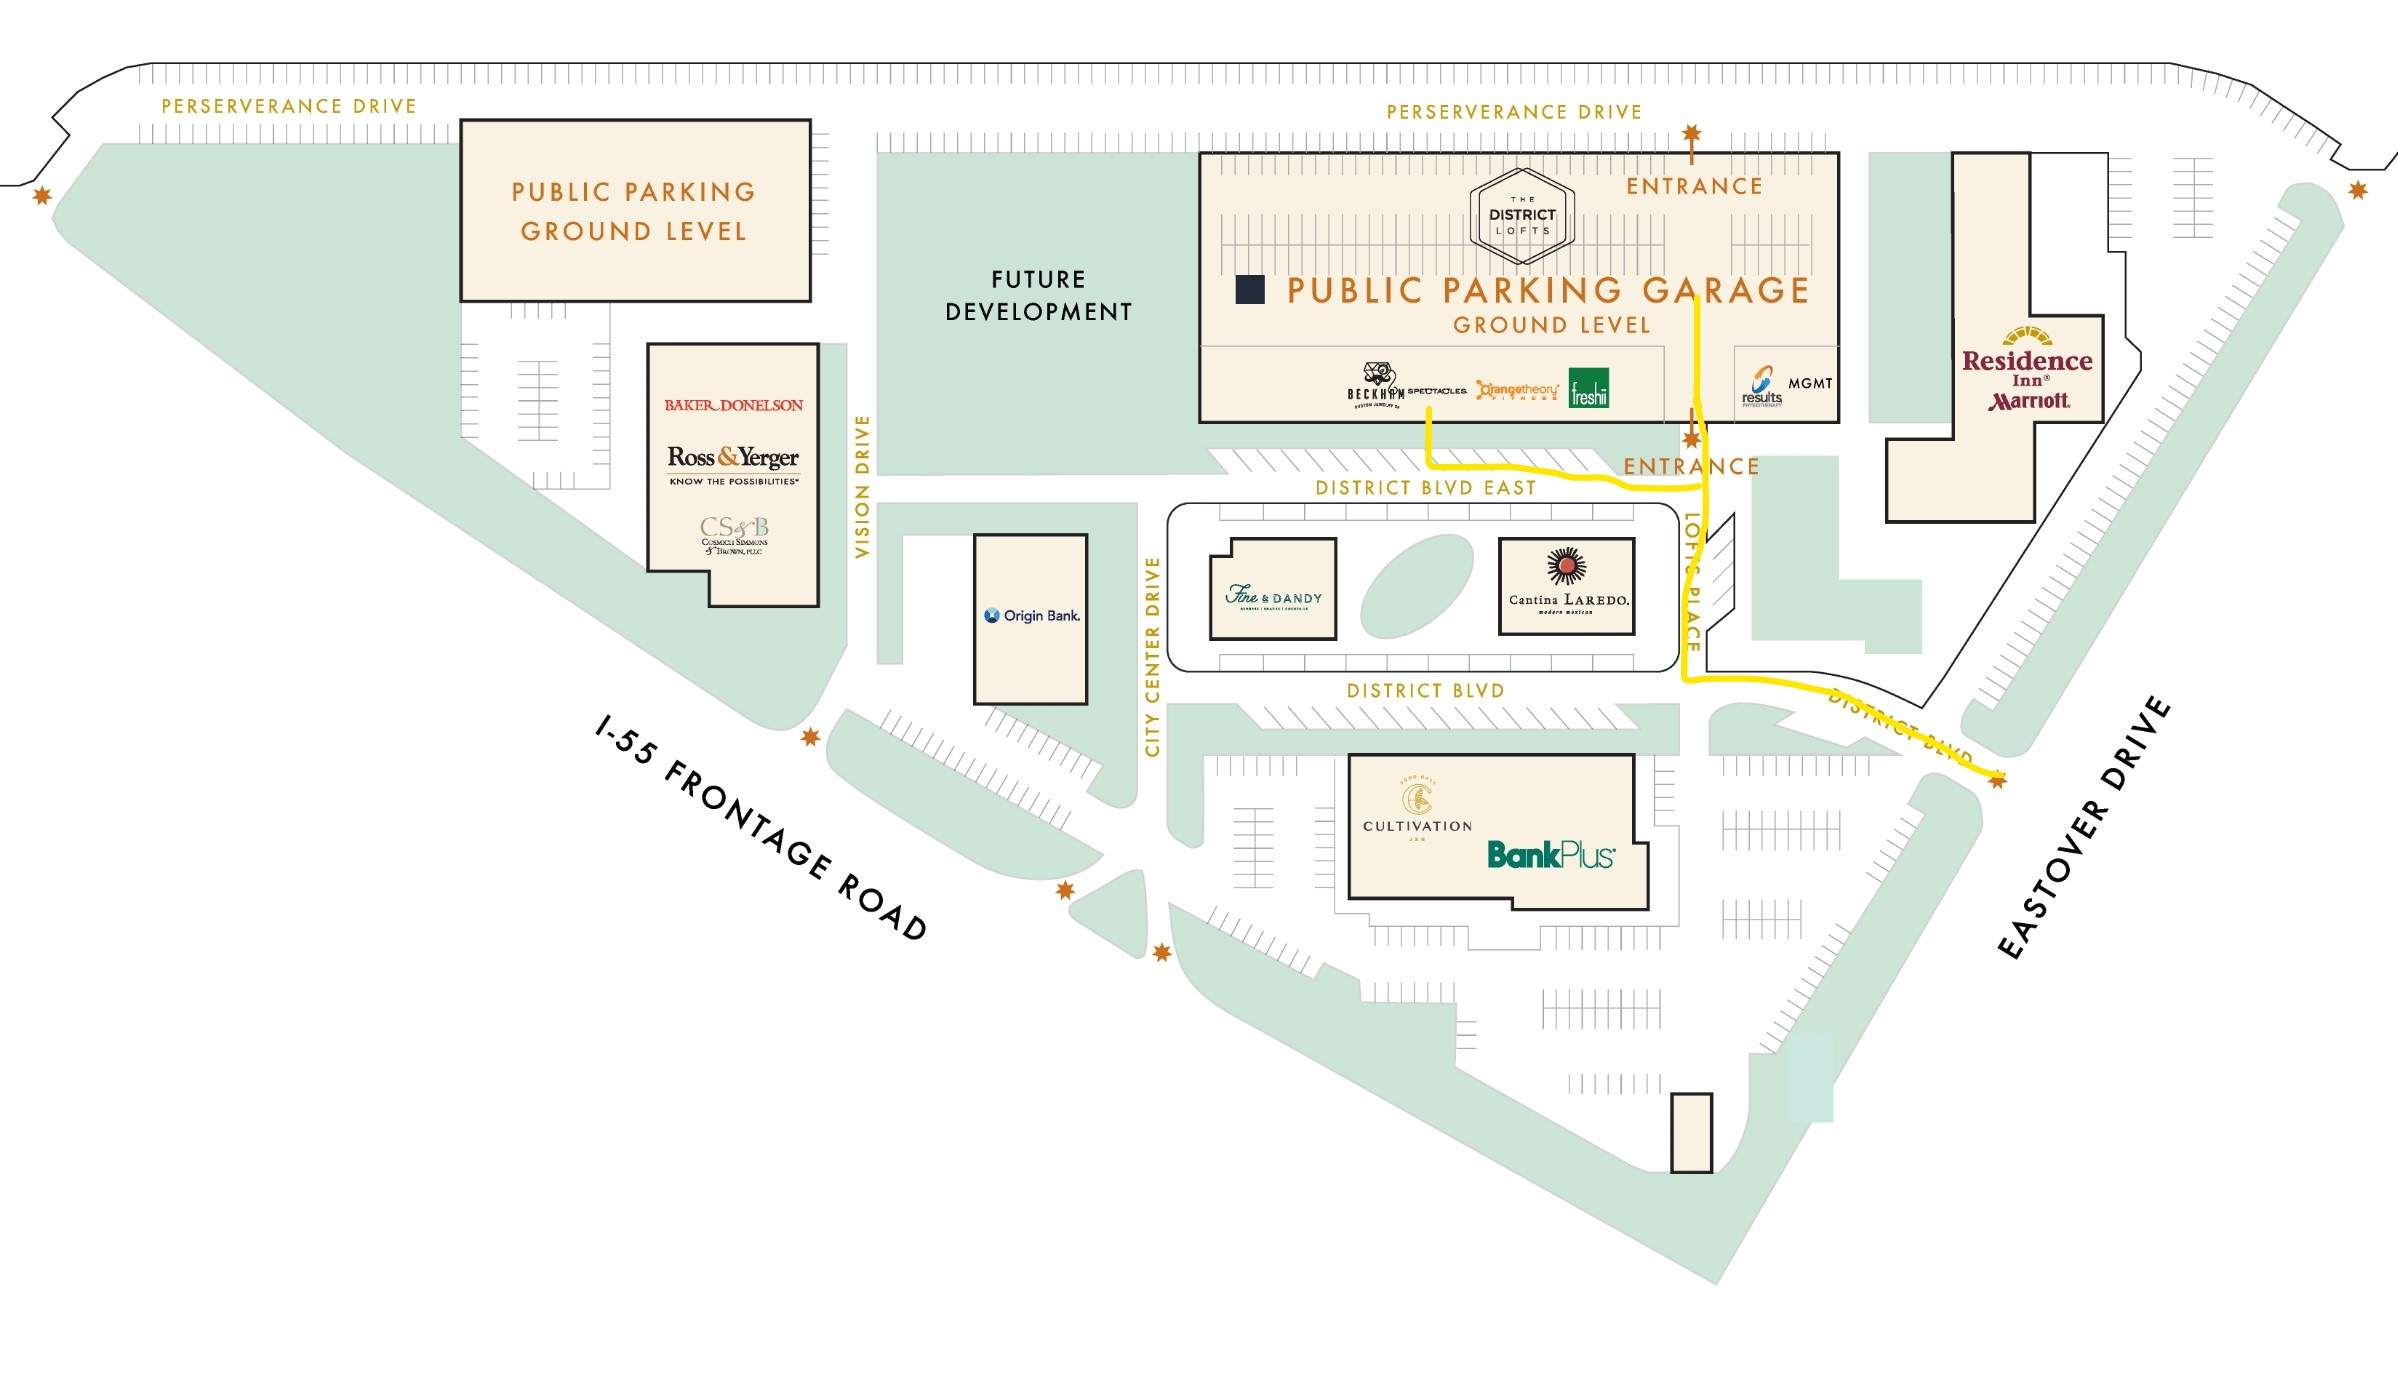 TDE-Parking-Map-2400px (3)_LI.jpg